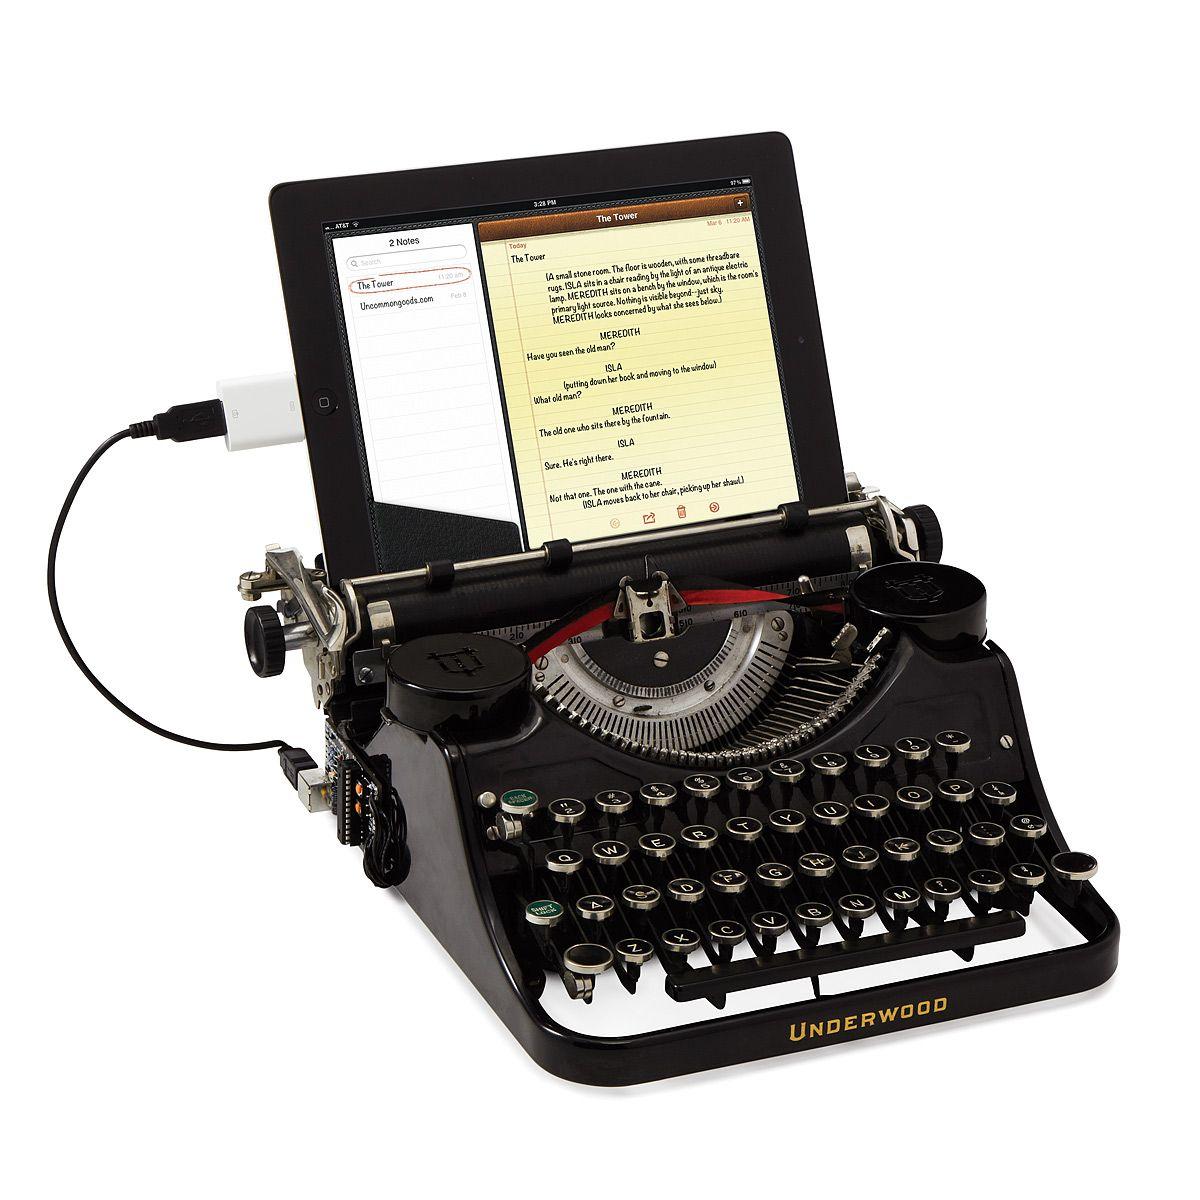 hipster level 9000 Typewriter, Usb, Ipad accessories